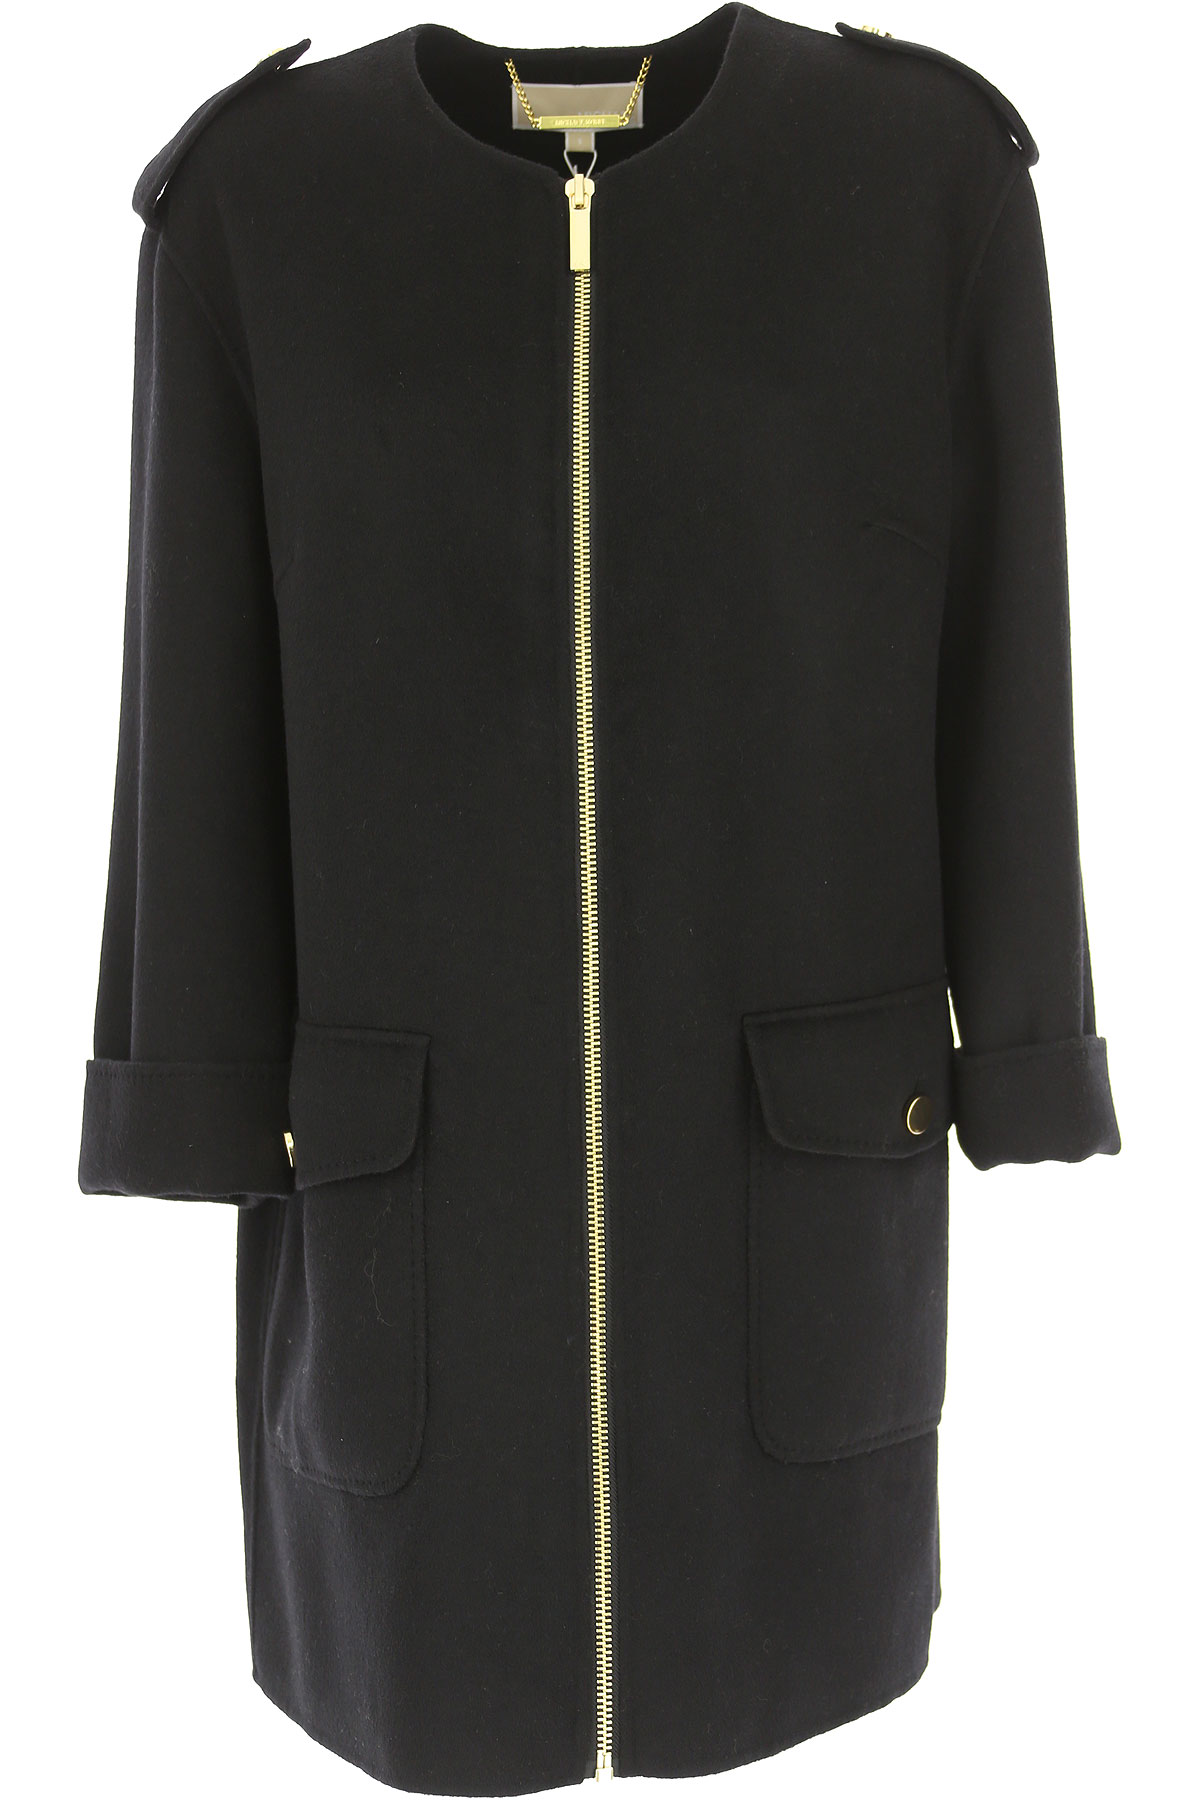 Michael Kors Women\s Coat, Black, Wool, 2019, 10 12 14 6 8